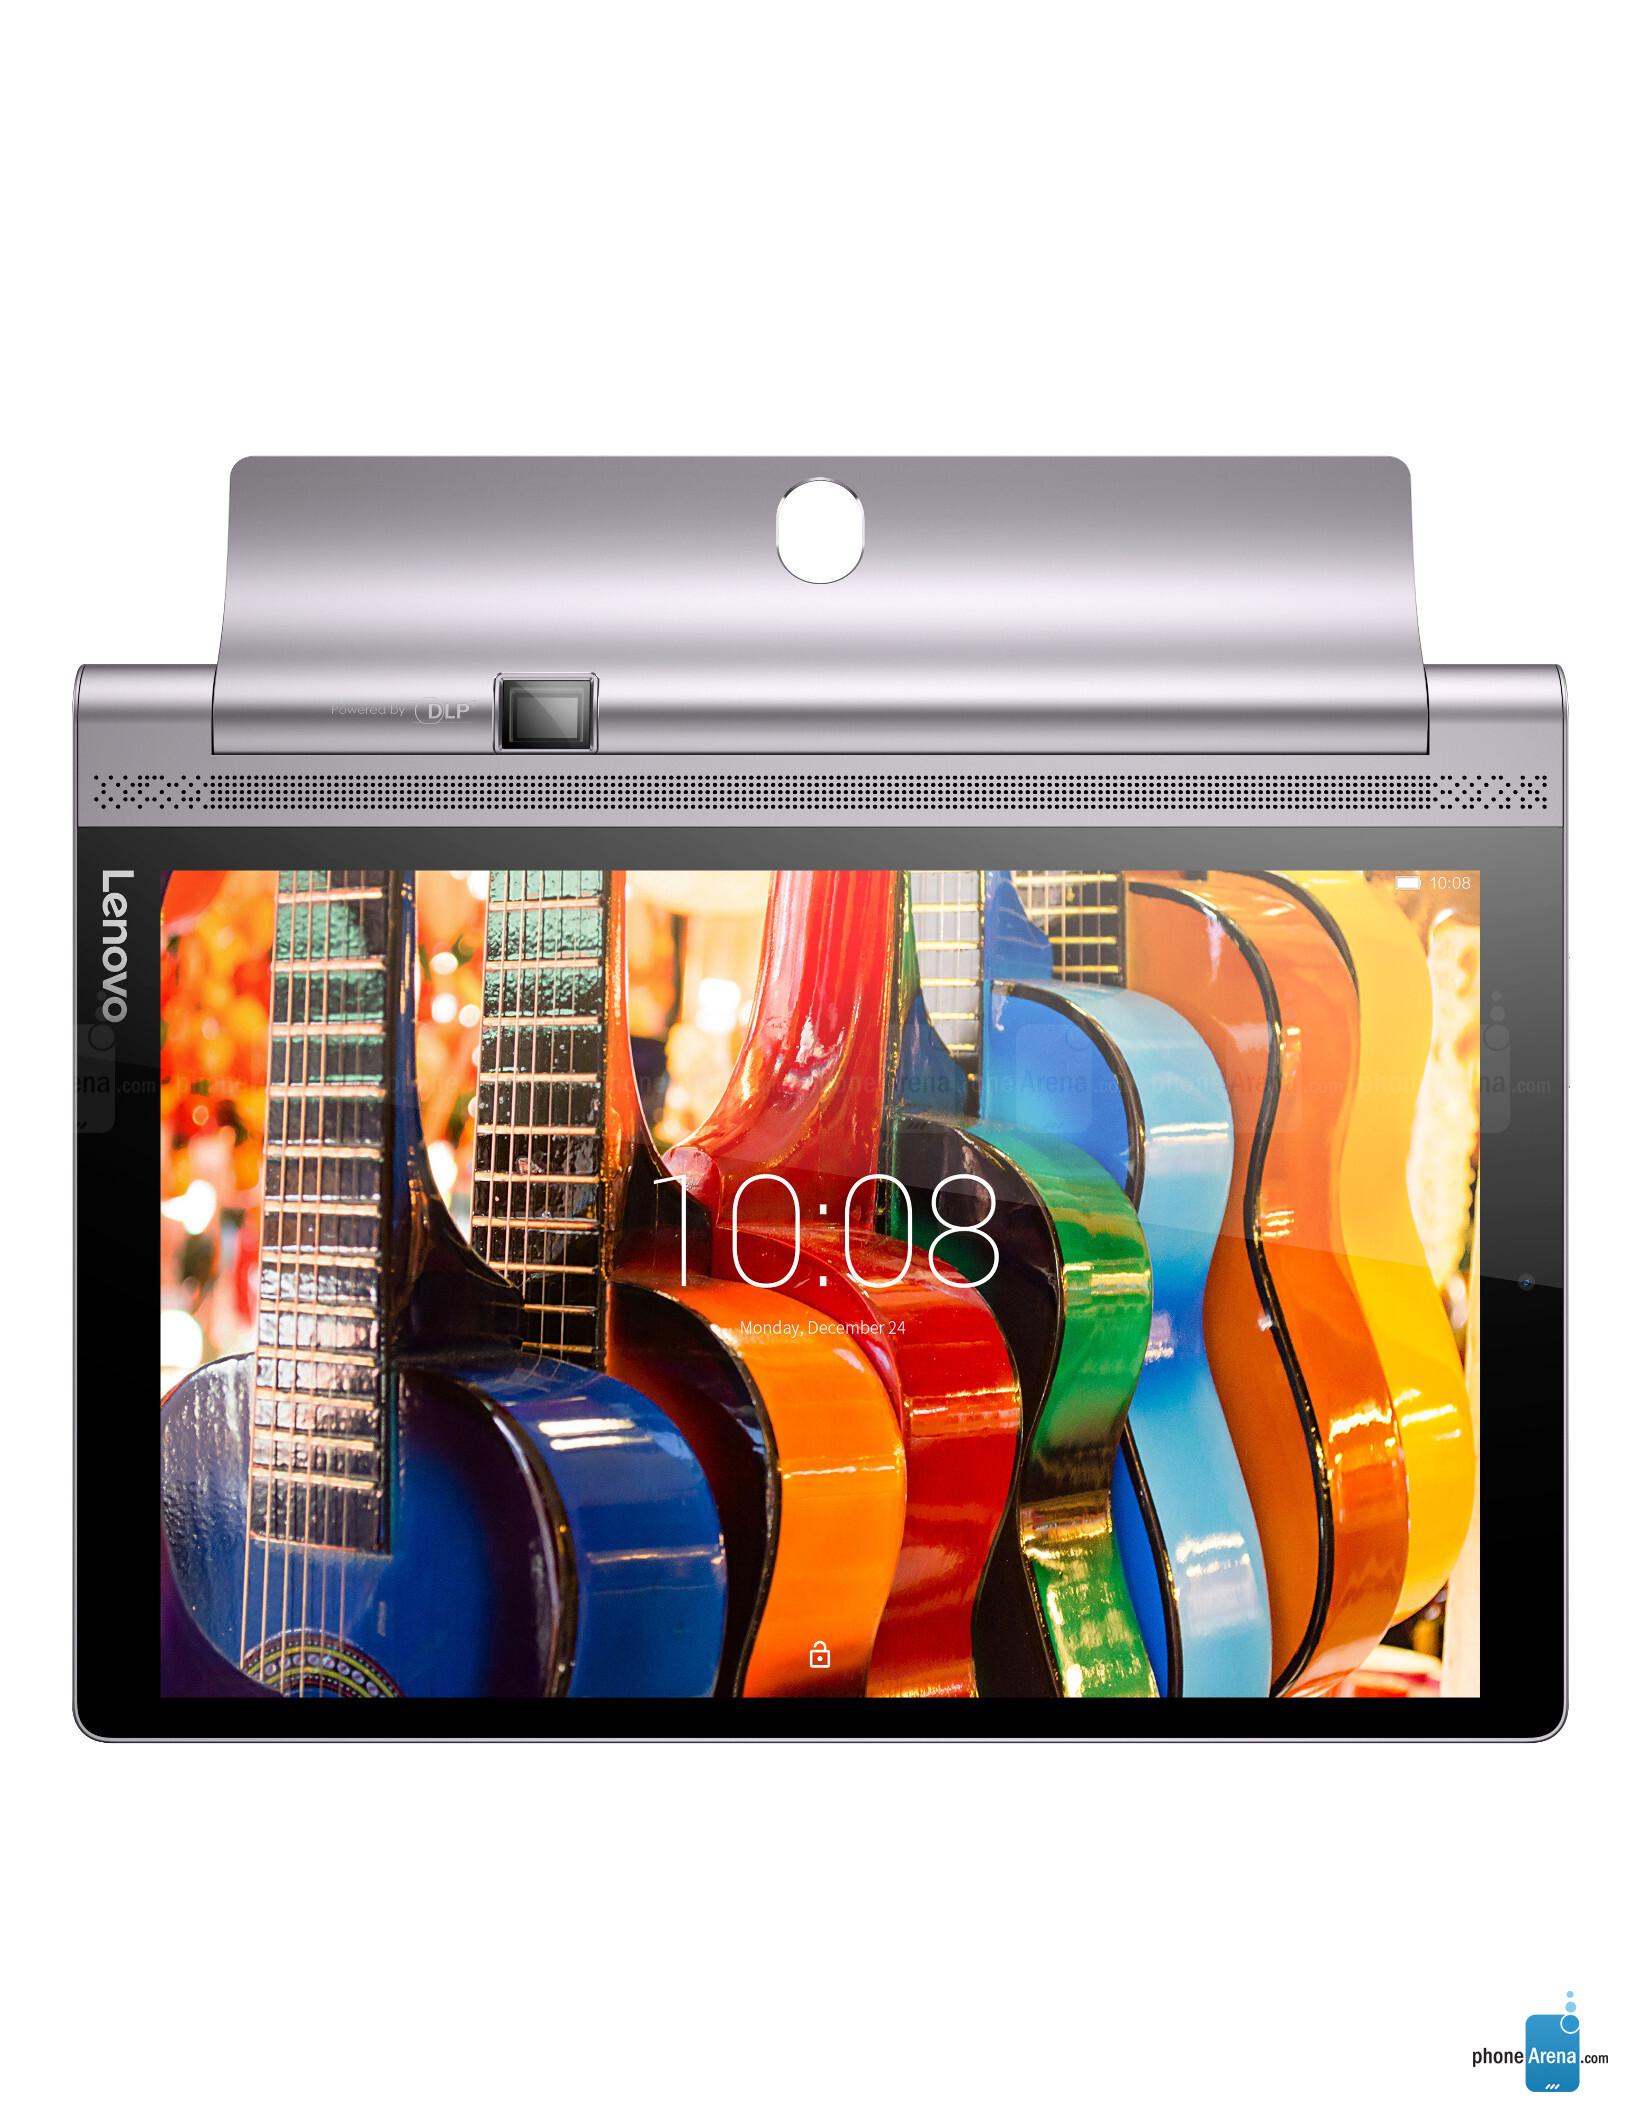 Lenovo Yoga Tab 3 Pro Specs